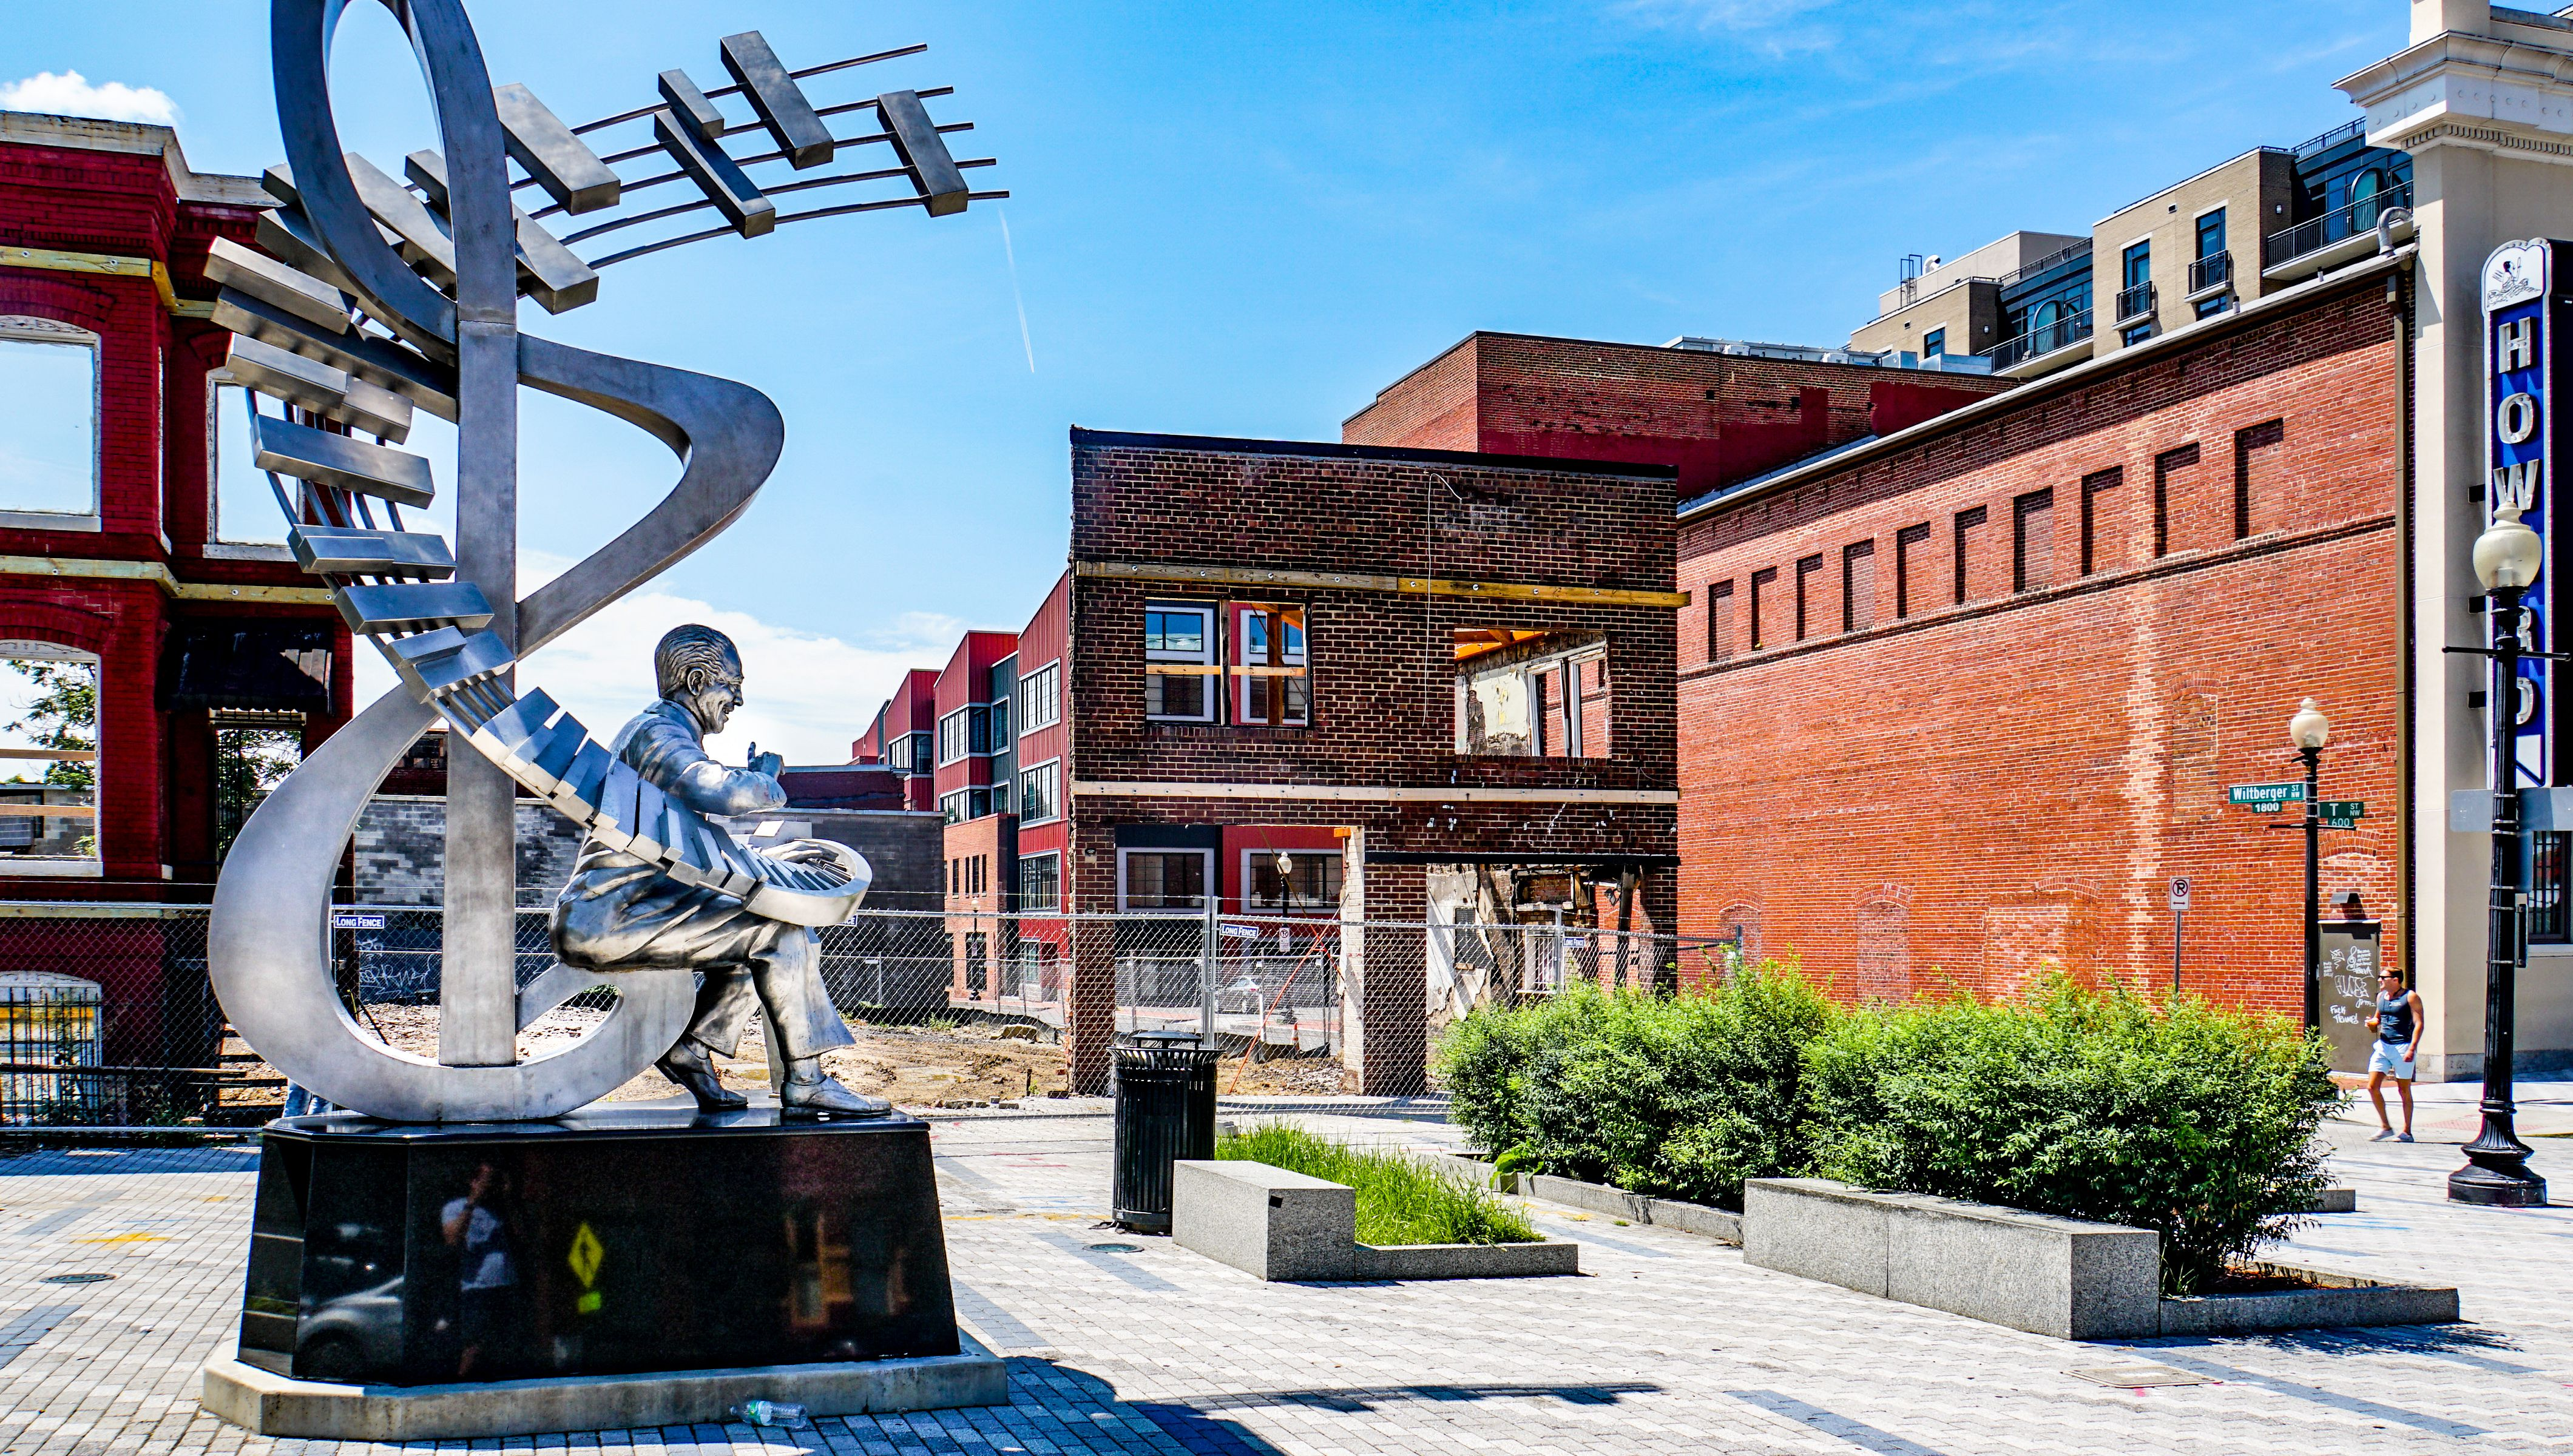 Duke Ellington statue, Le Droit Park, Shaw neighborhood, Washington, D.C.